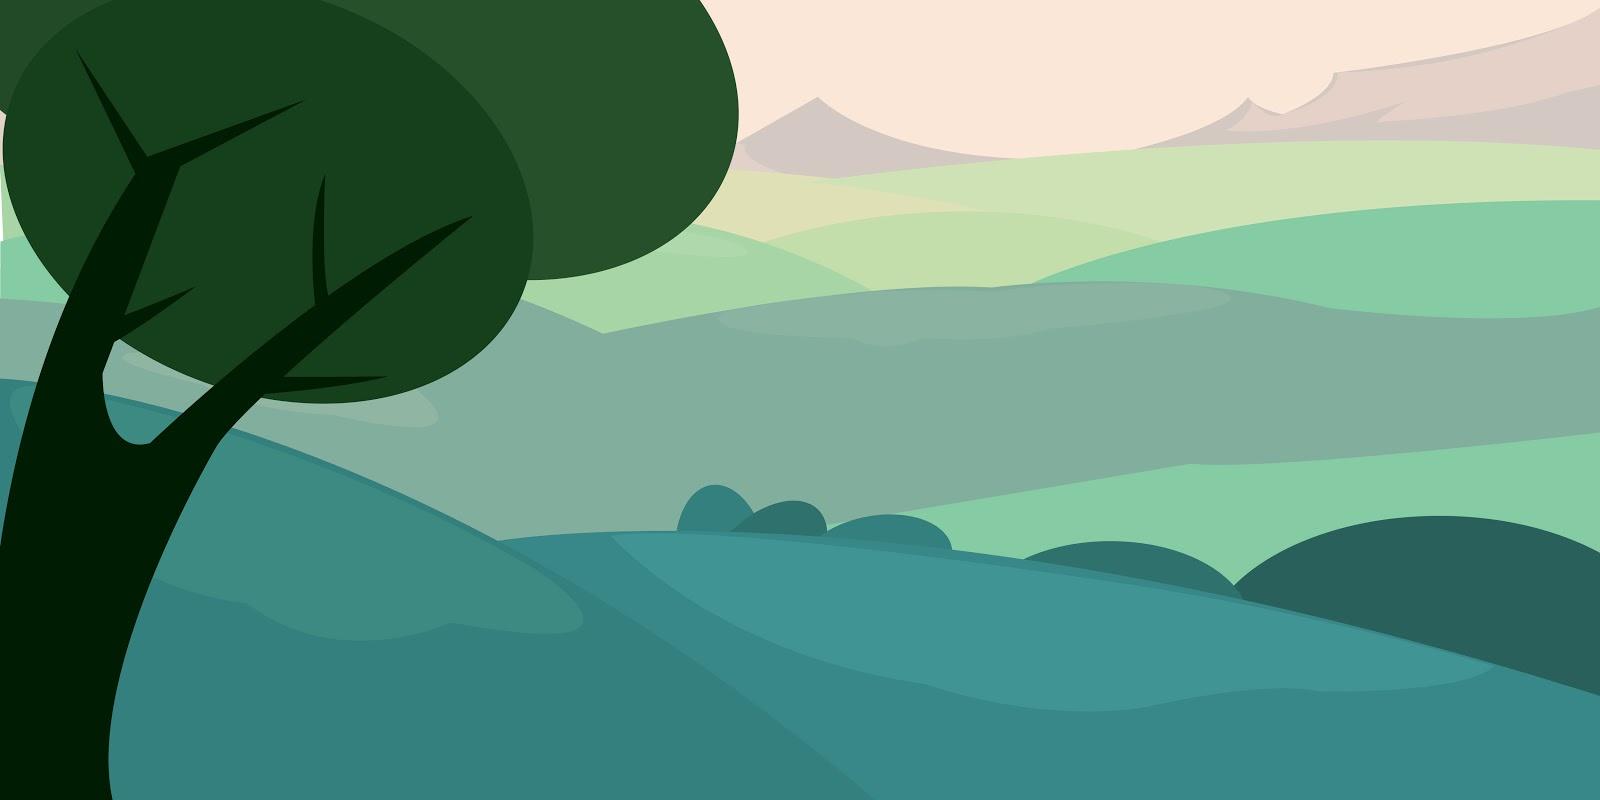 cartoon landscape clipart - photo #49